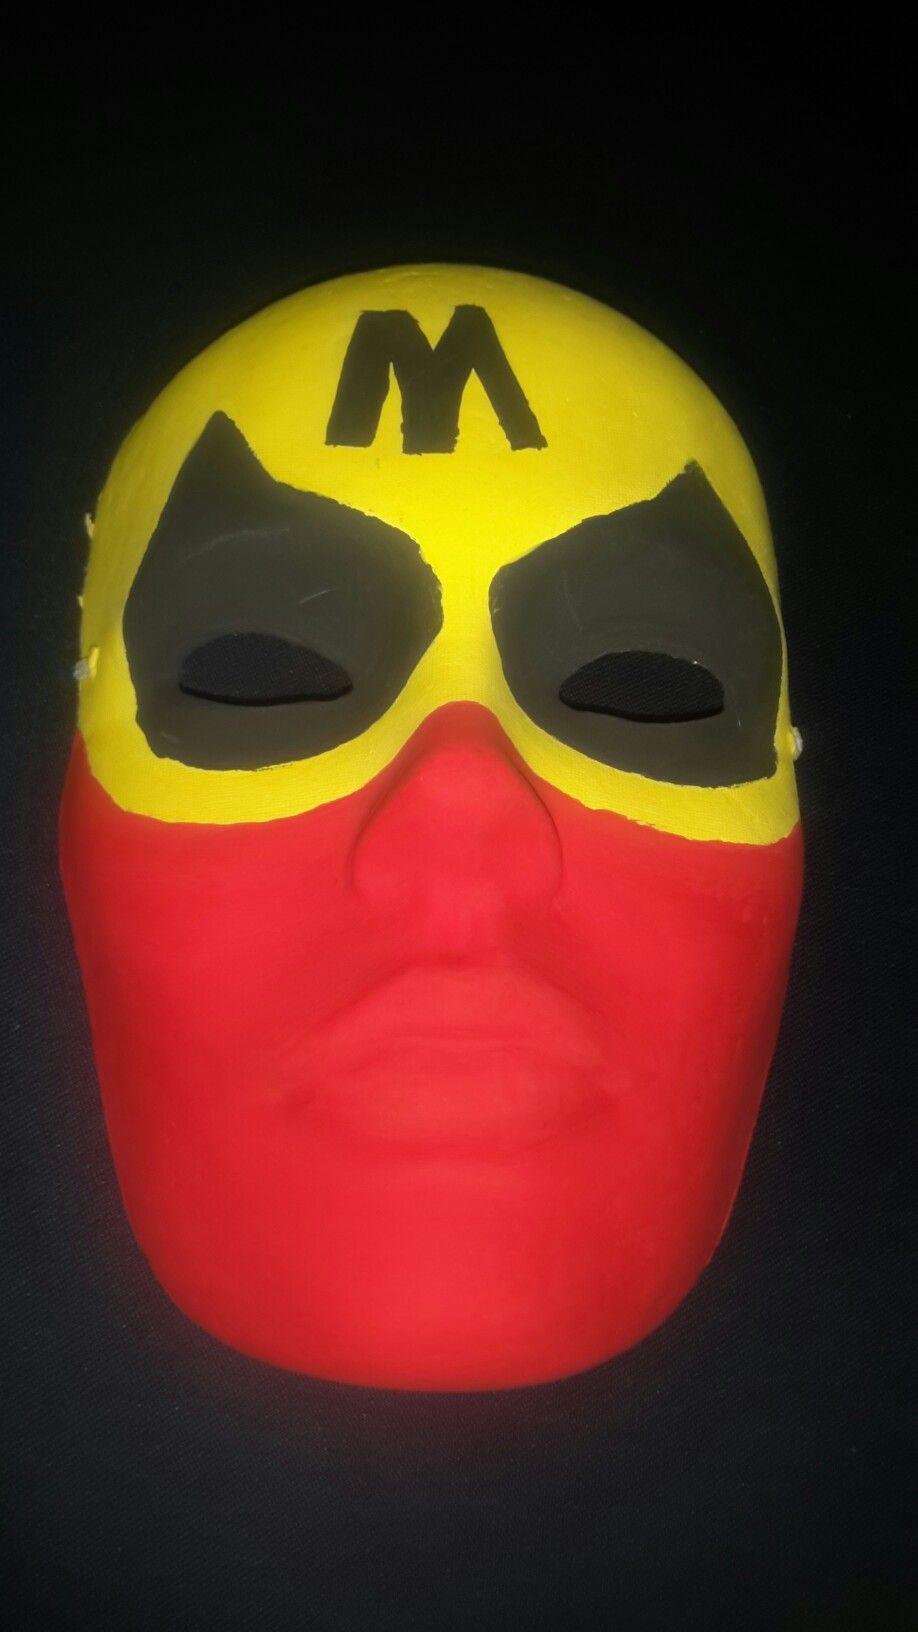 Oglumun Maske Boyamasi